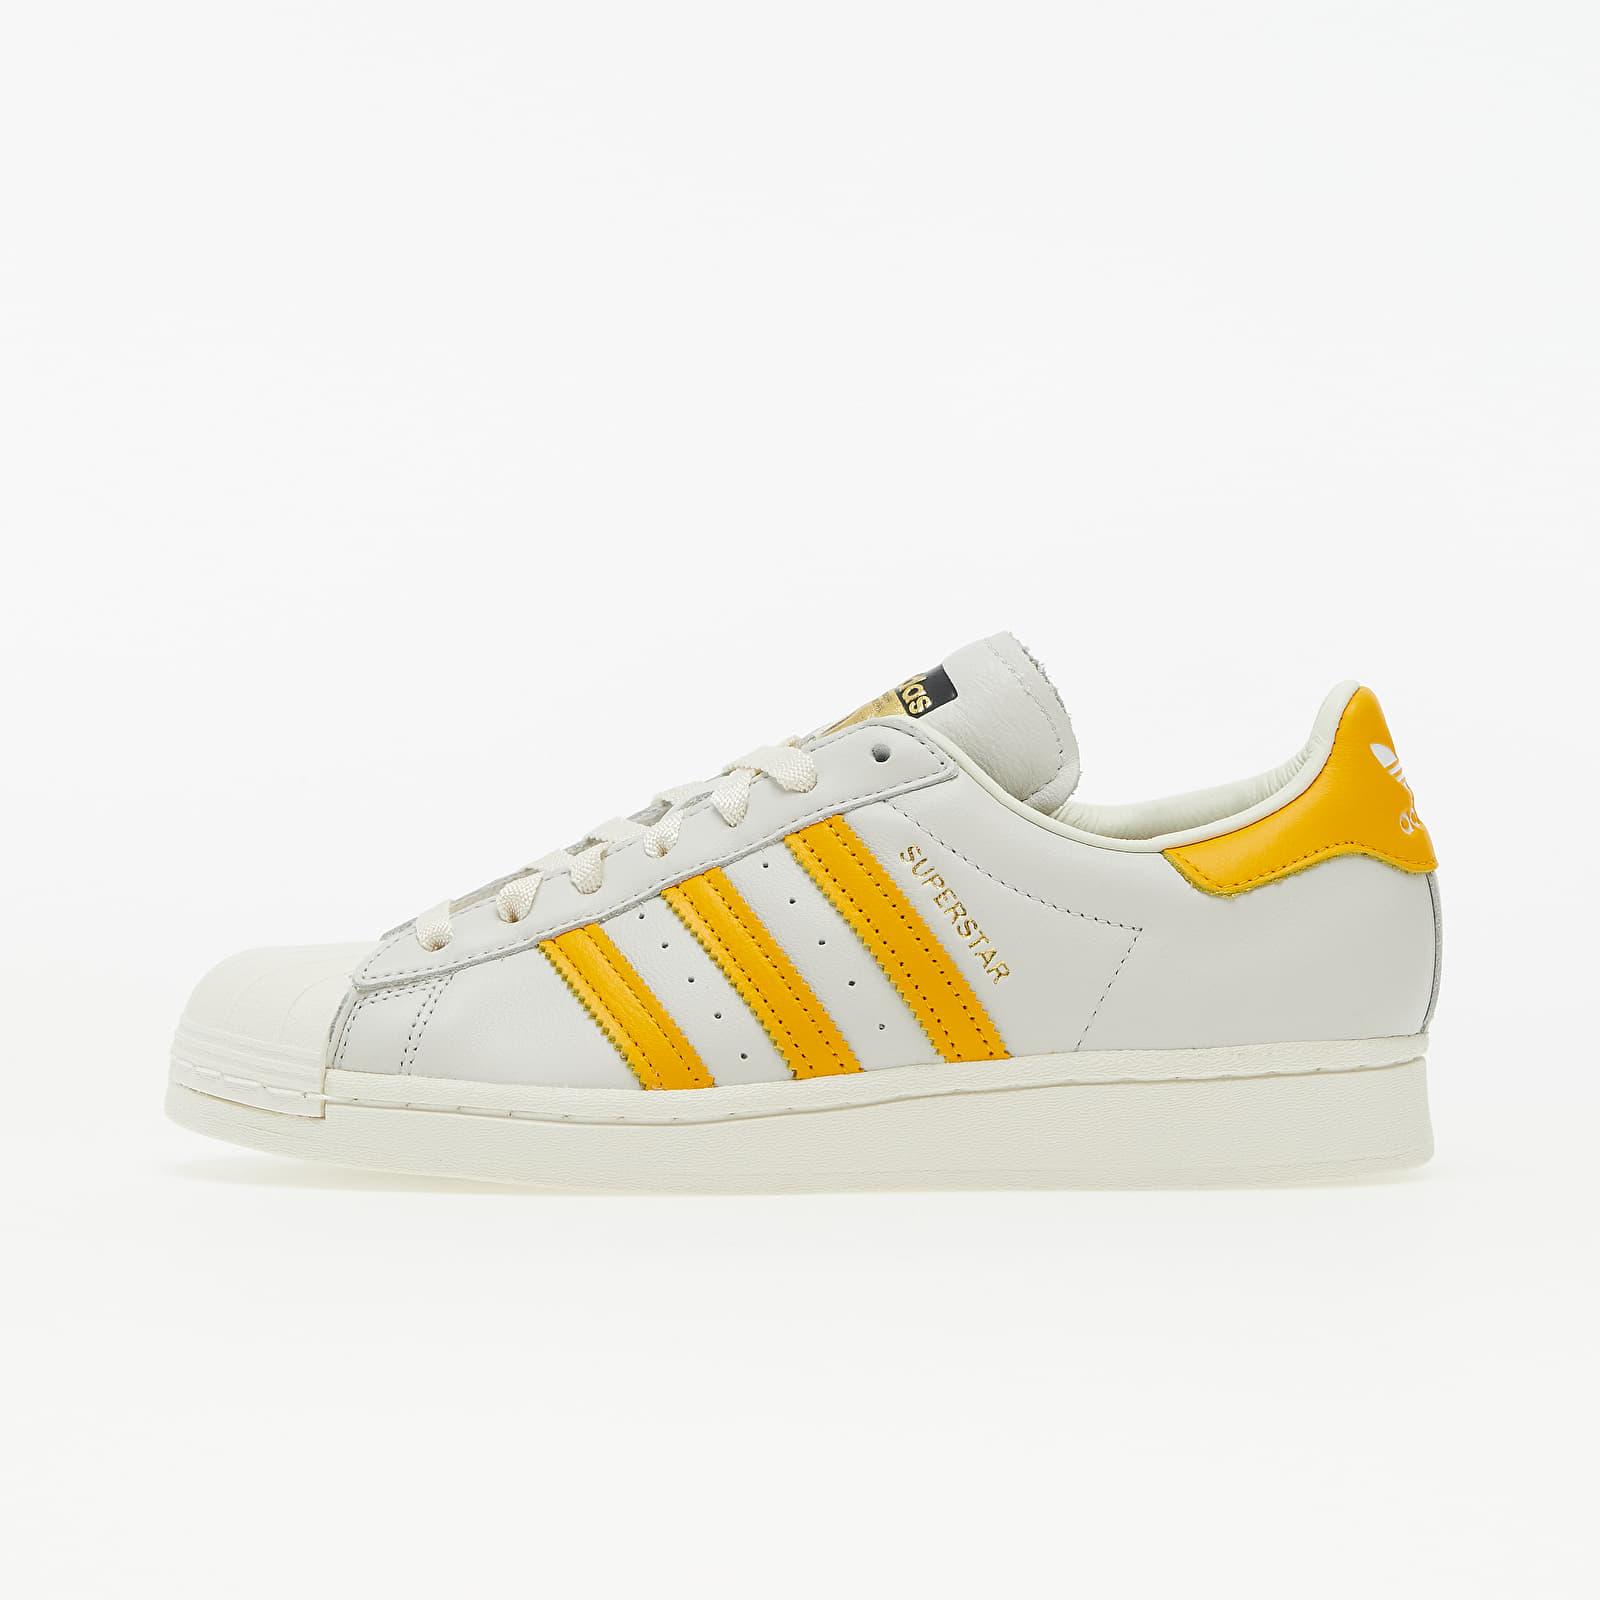 adidas Superstar Off White/ Collegiate Gold/ Off White H68170